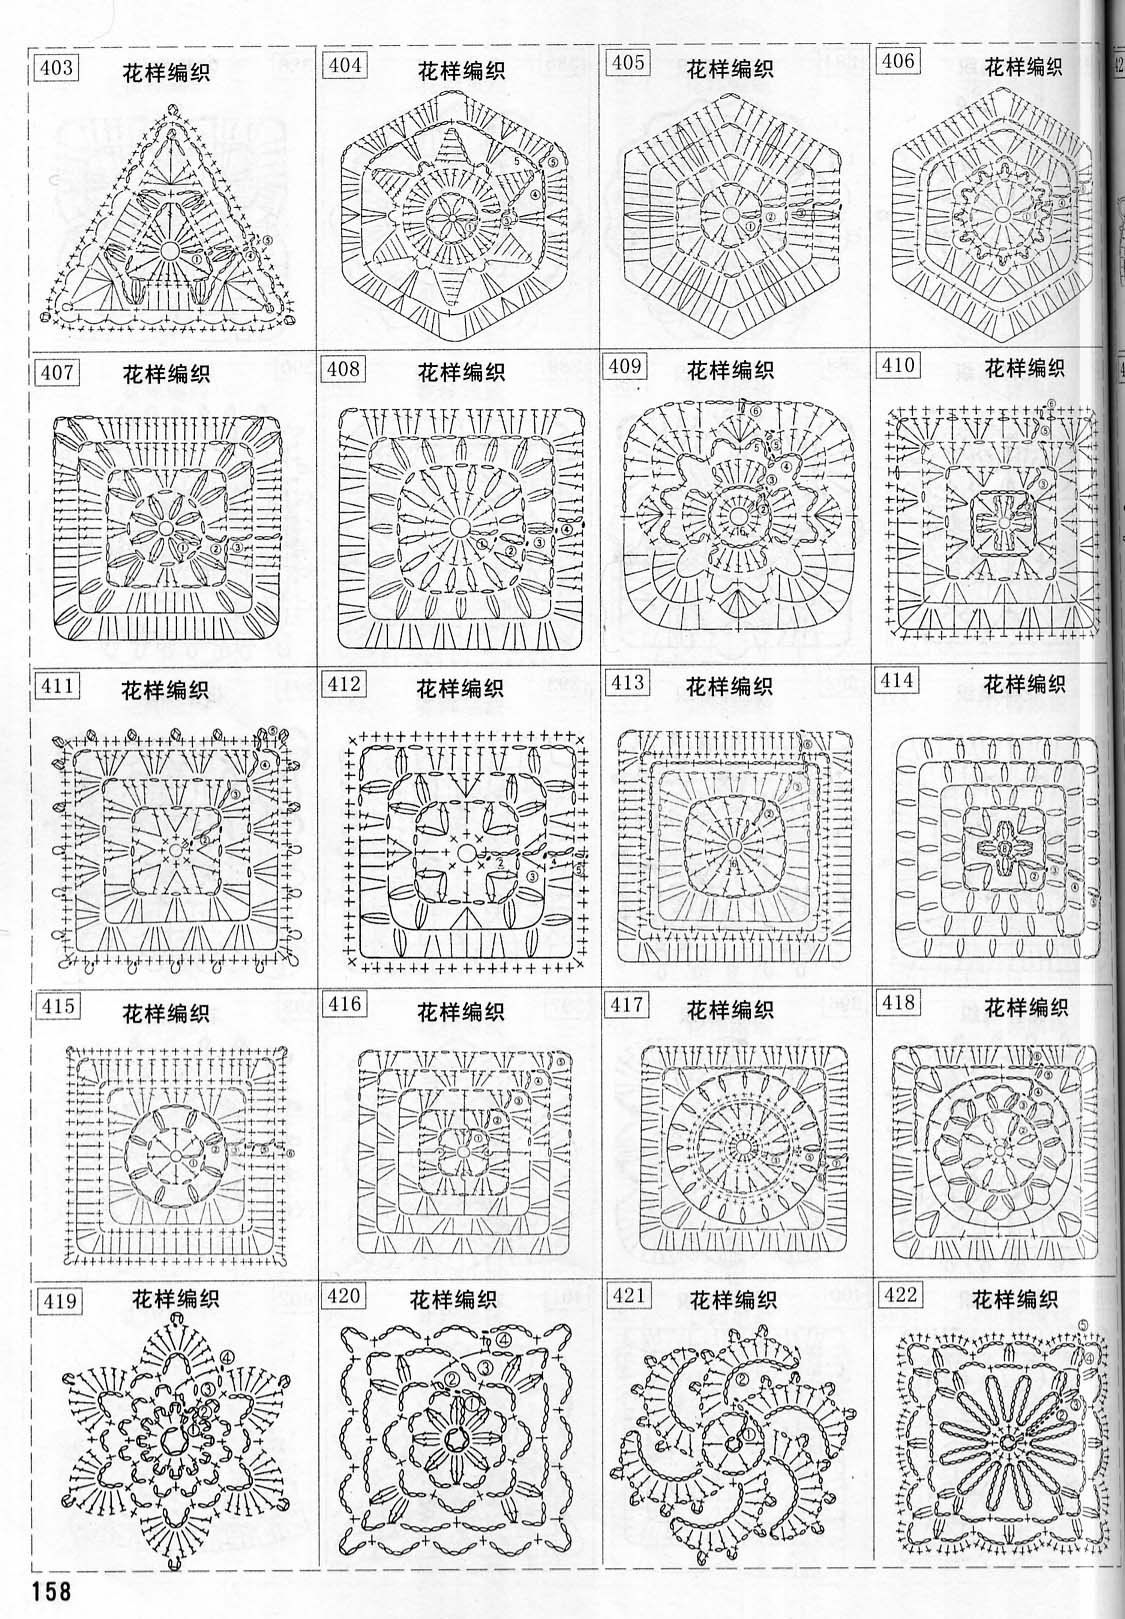 crochet granny square diagram 1965 mustang horn wiring 25 43 einzigartige quadrate häkeln ideen auf pinterest oma